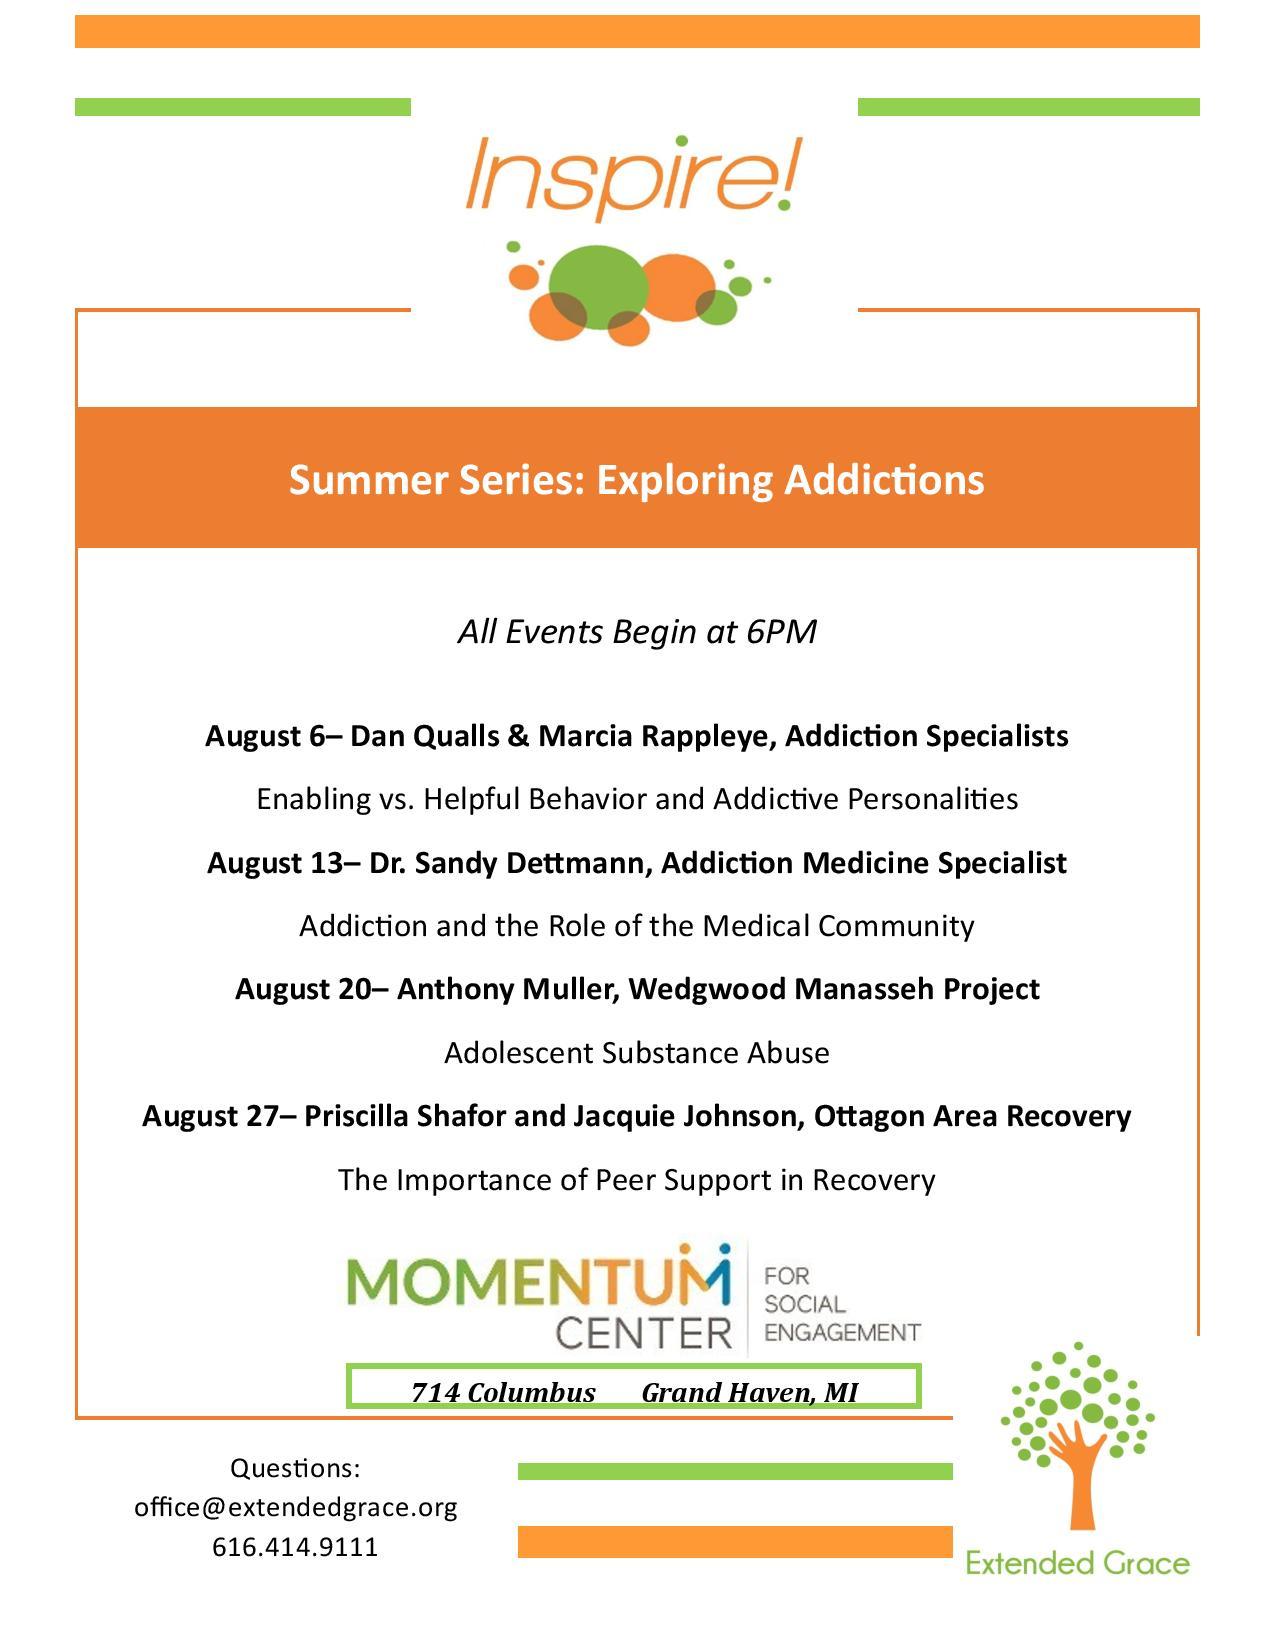 Exploring Addictions: Enabling Vs  Helpful Behavior and